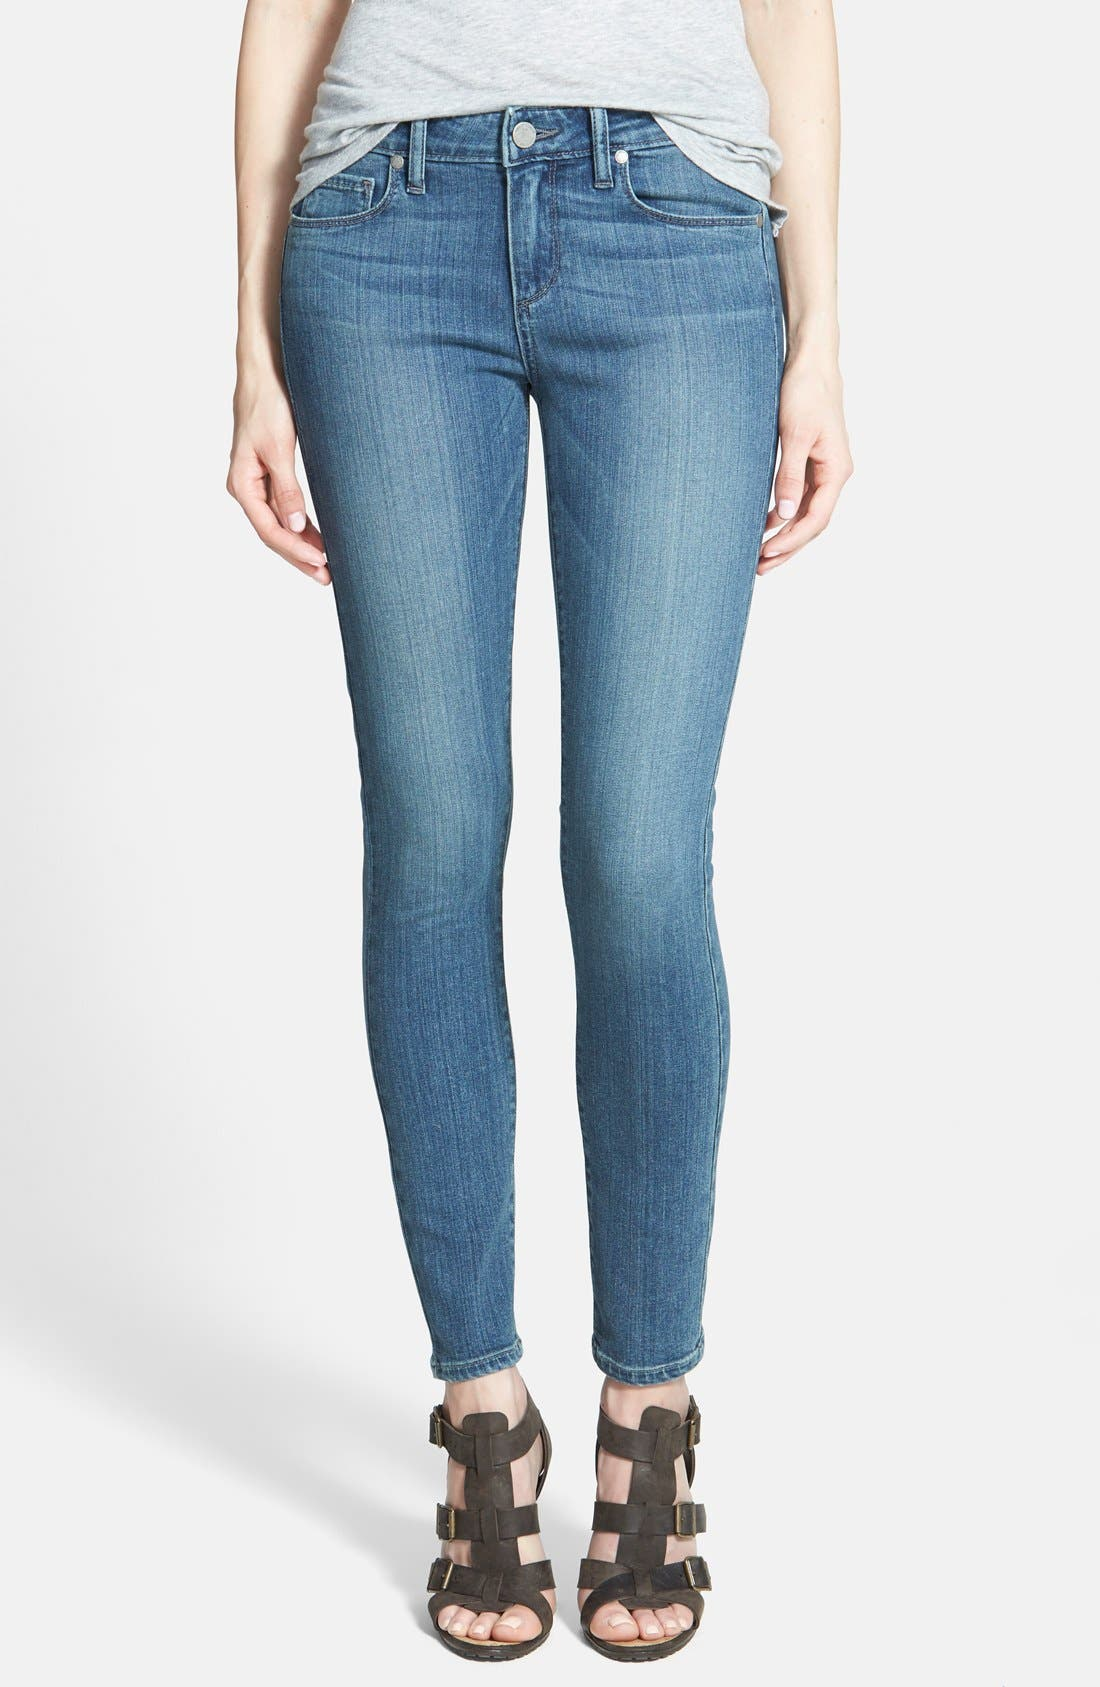 Alternate Image 1 Selected - Paige Denim 'Verdugo' Low Rise Ankle Skinny Jeans (Dazeley)